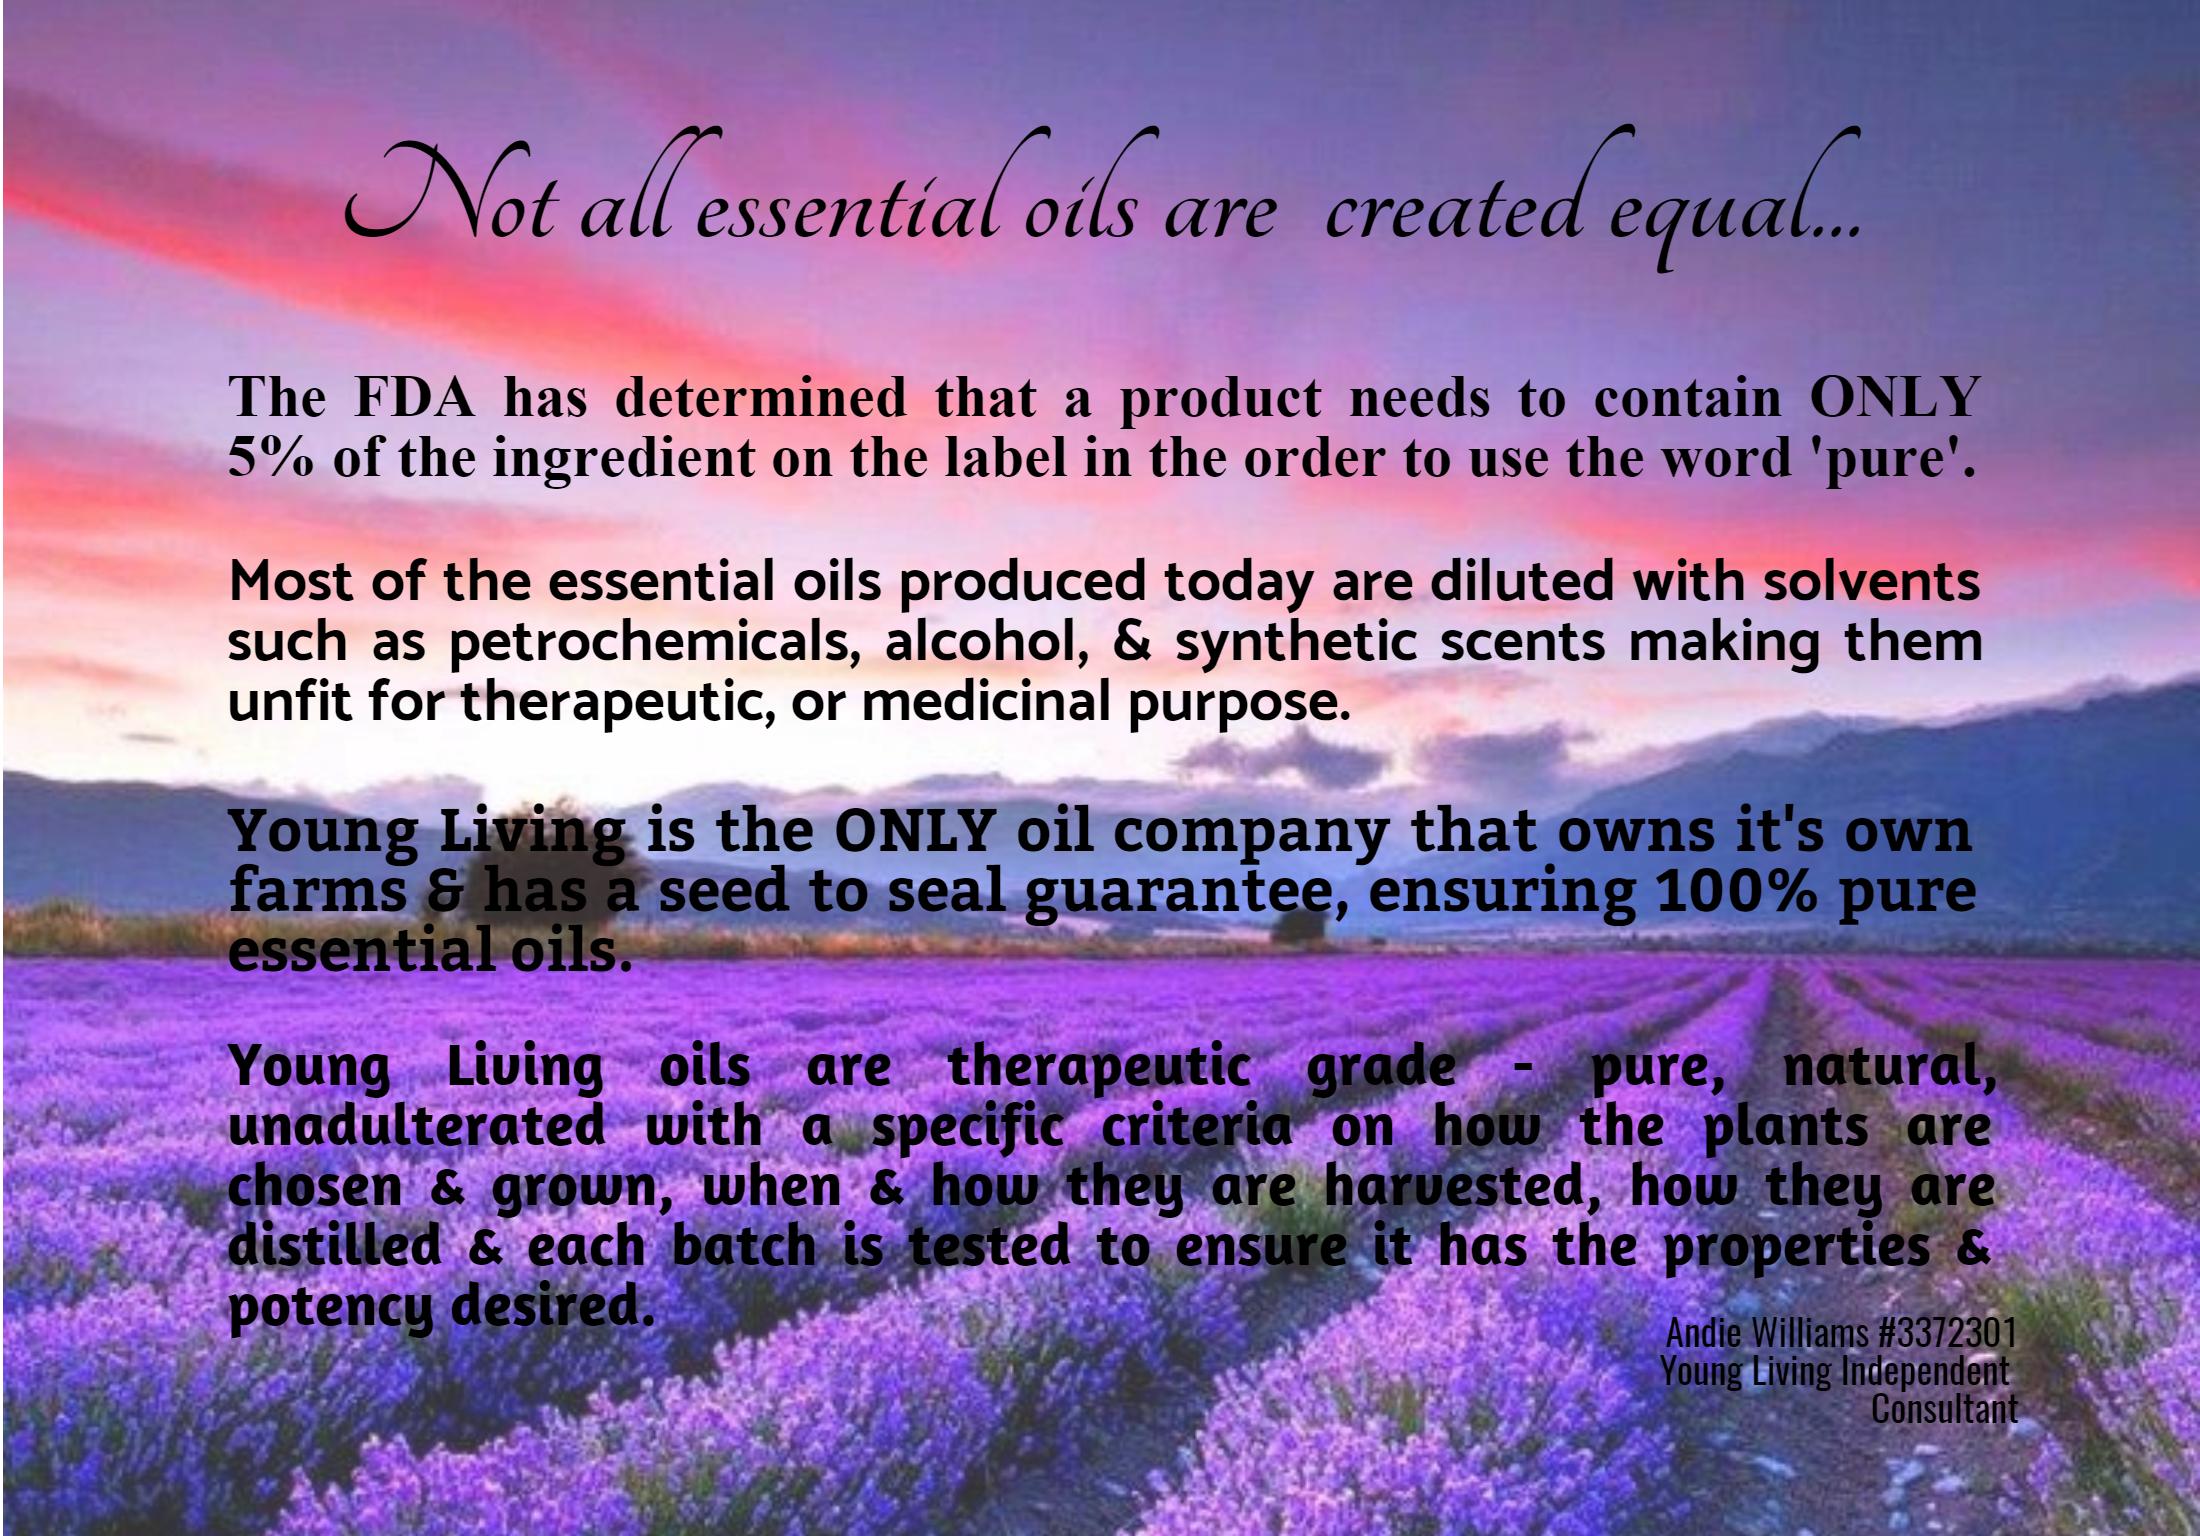 Lavender,                Flower,                Purple,                Text,                Sky,                Morning,                Violet,                English,                Phenomenon,                White,                Black,                Blue,                Fuchsia,                 Free Image